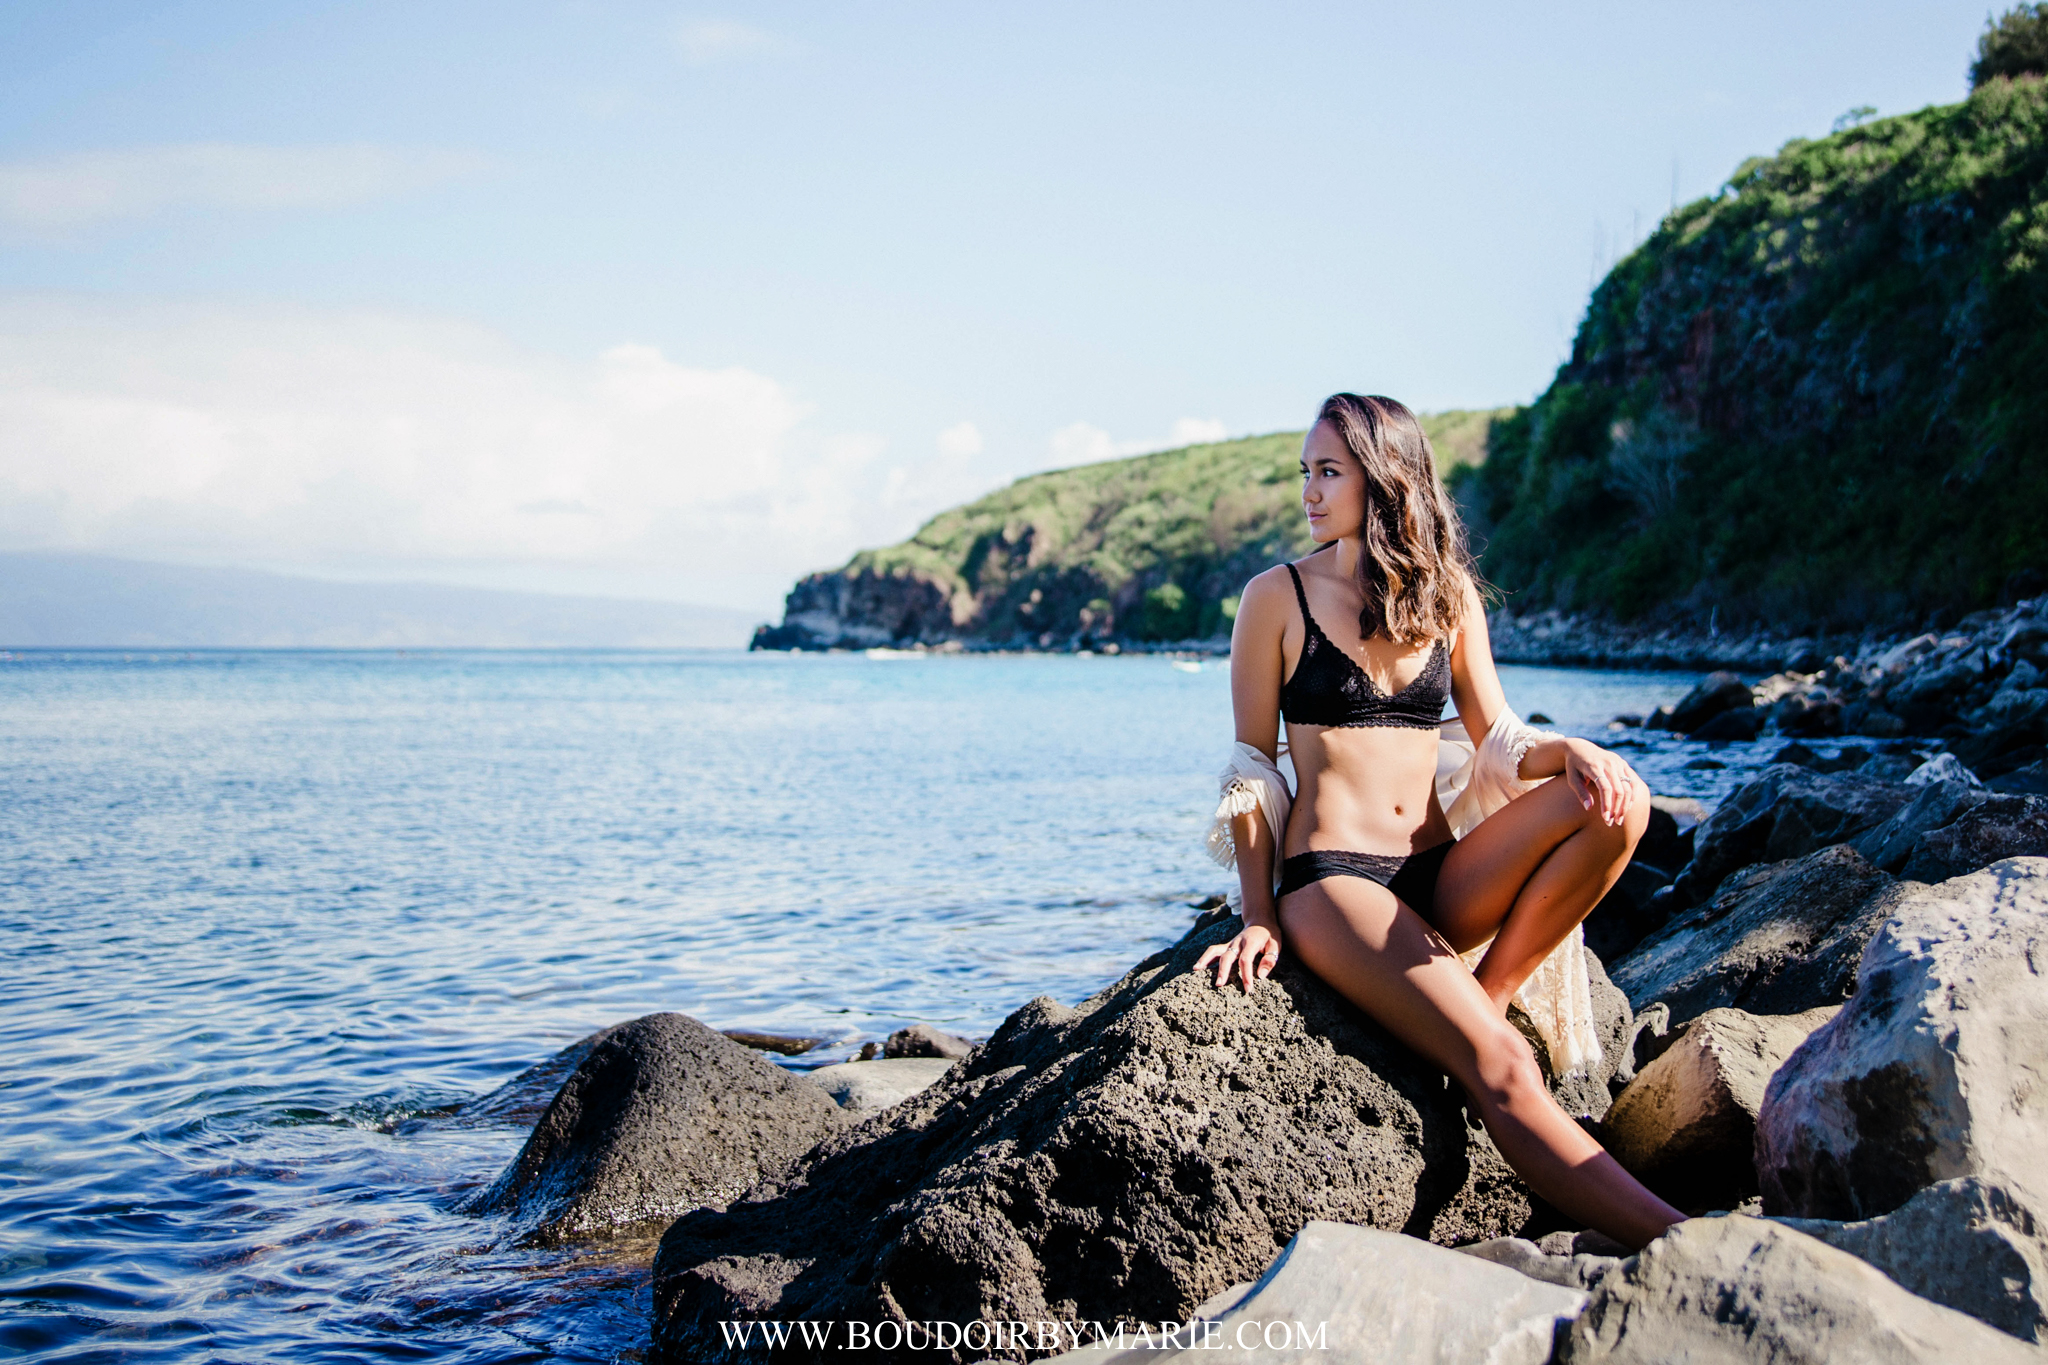 BoudoirbyMarie-MauiHawaiiBoudoir-13.jpg